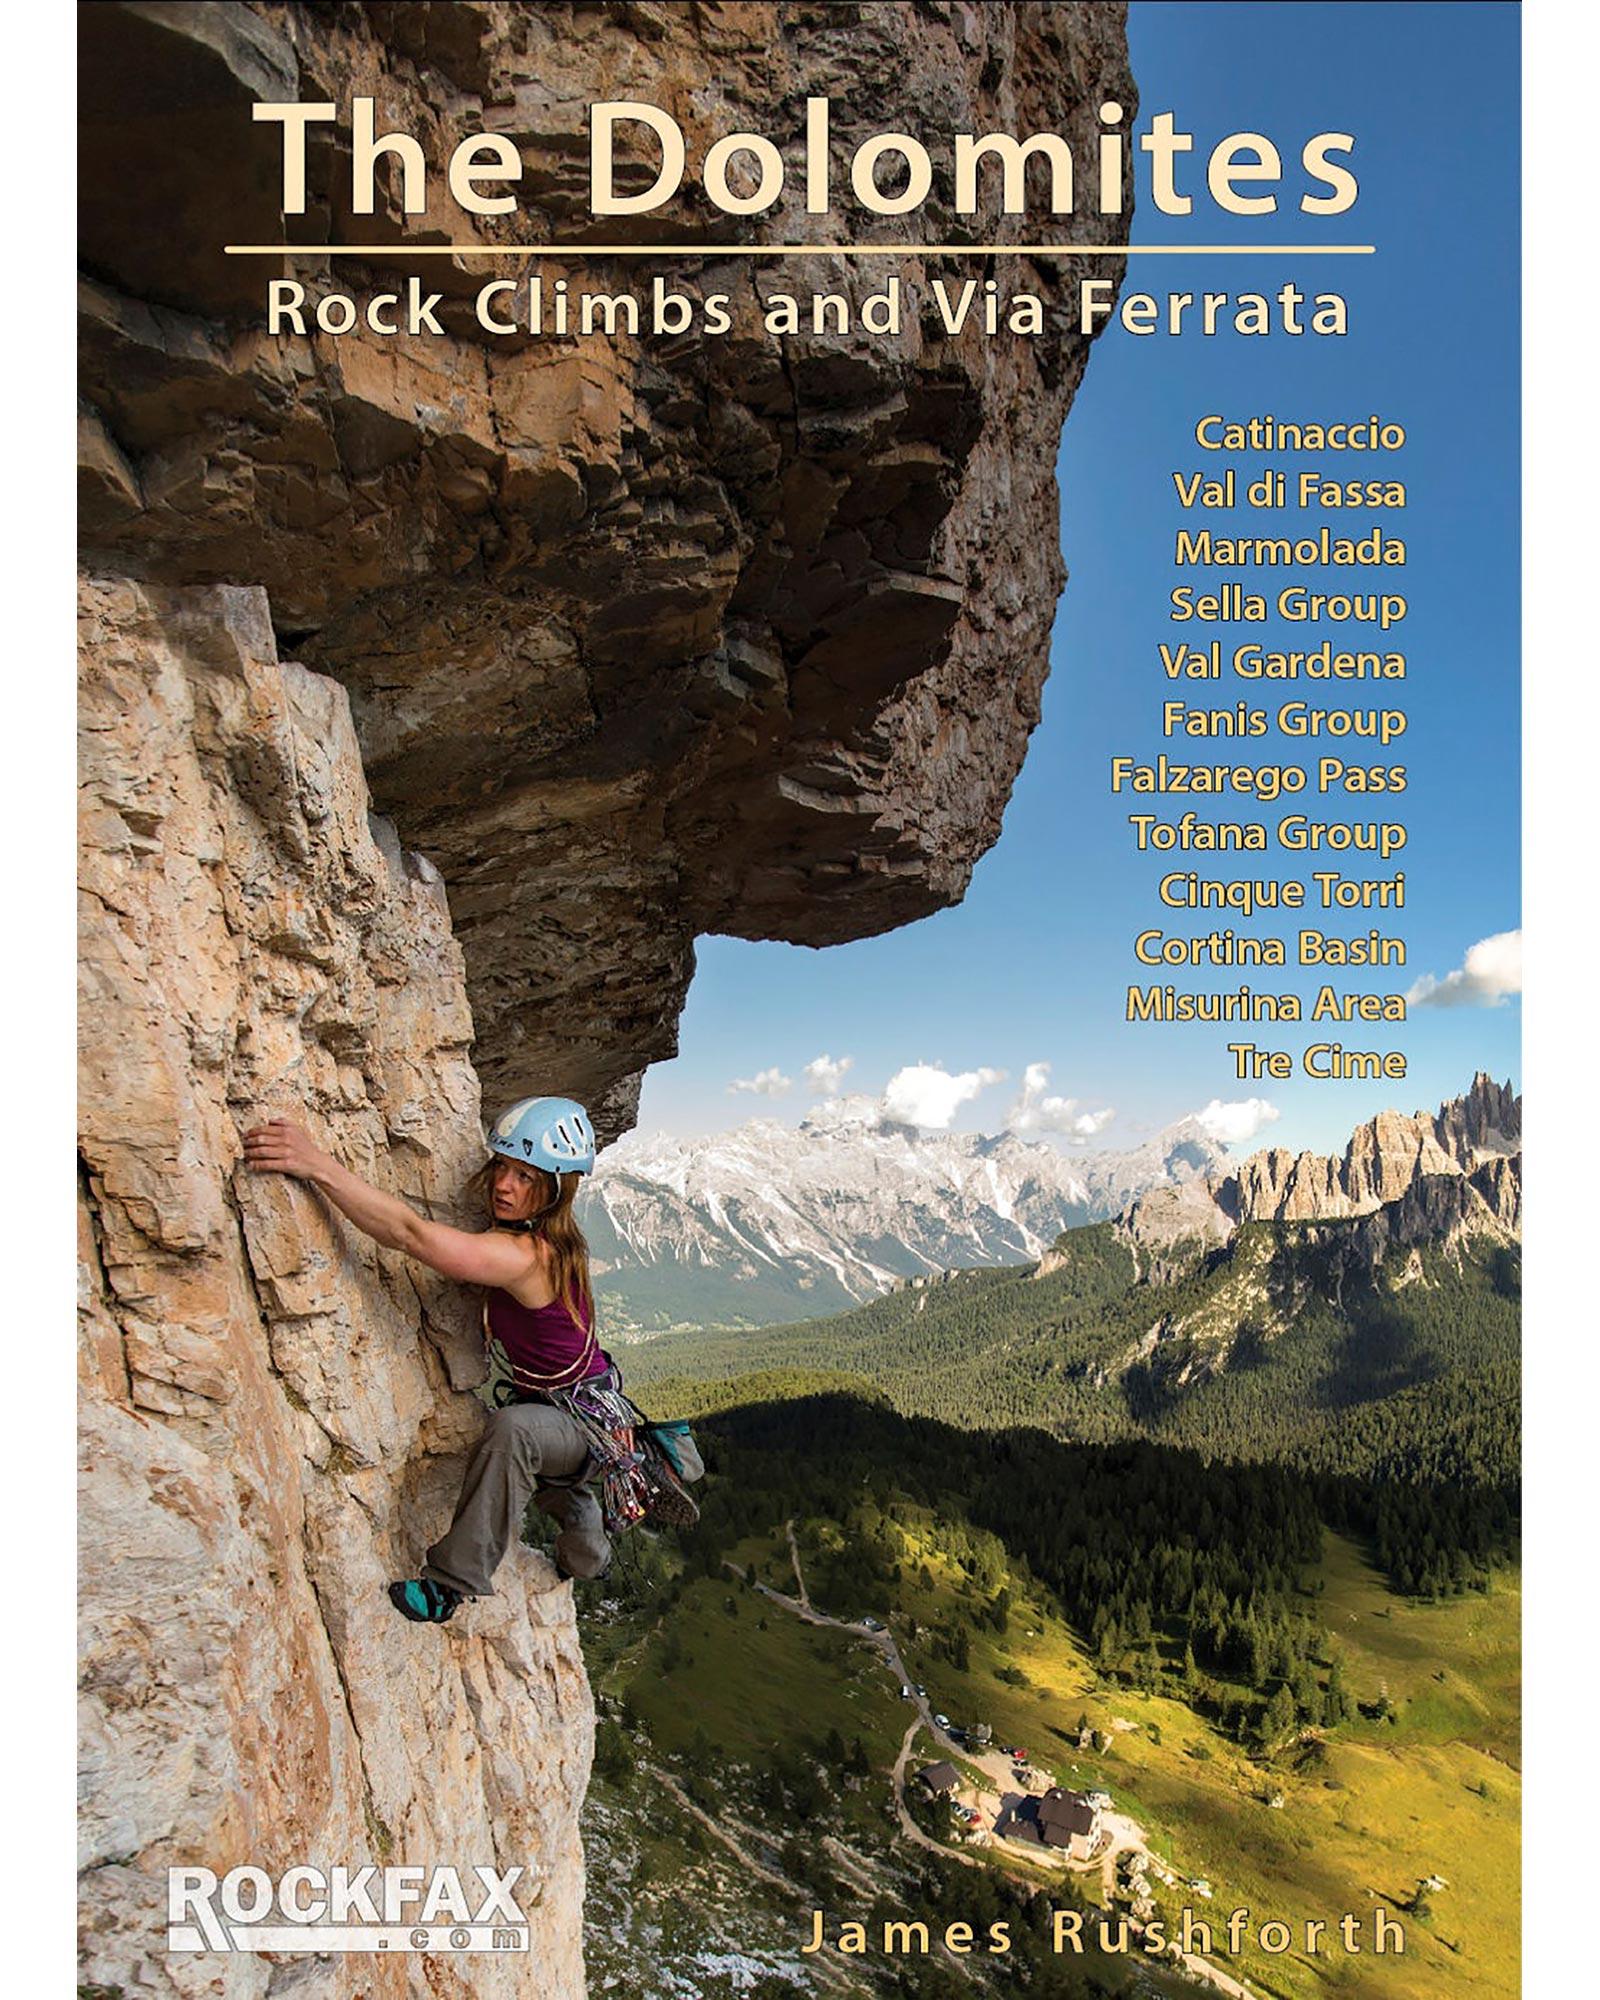 Rockfax Western Grit Rockfax Guide Book